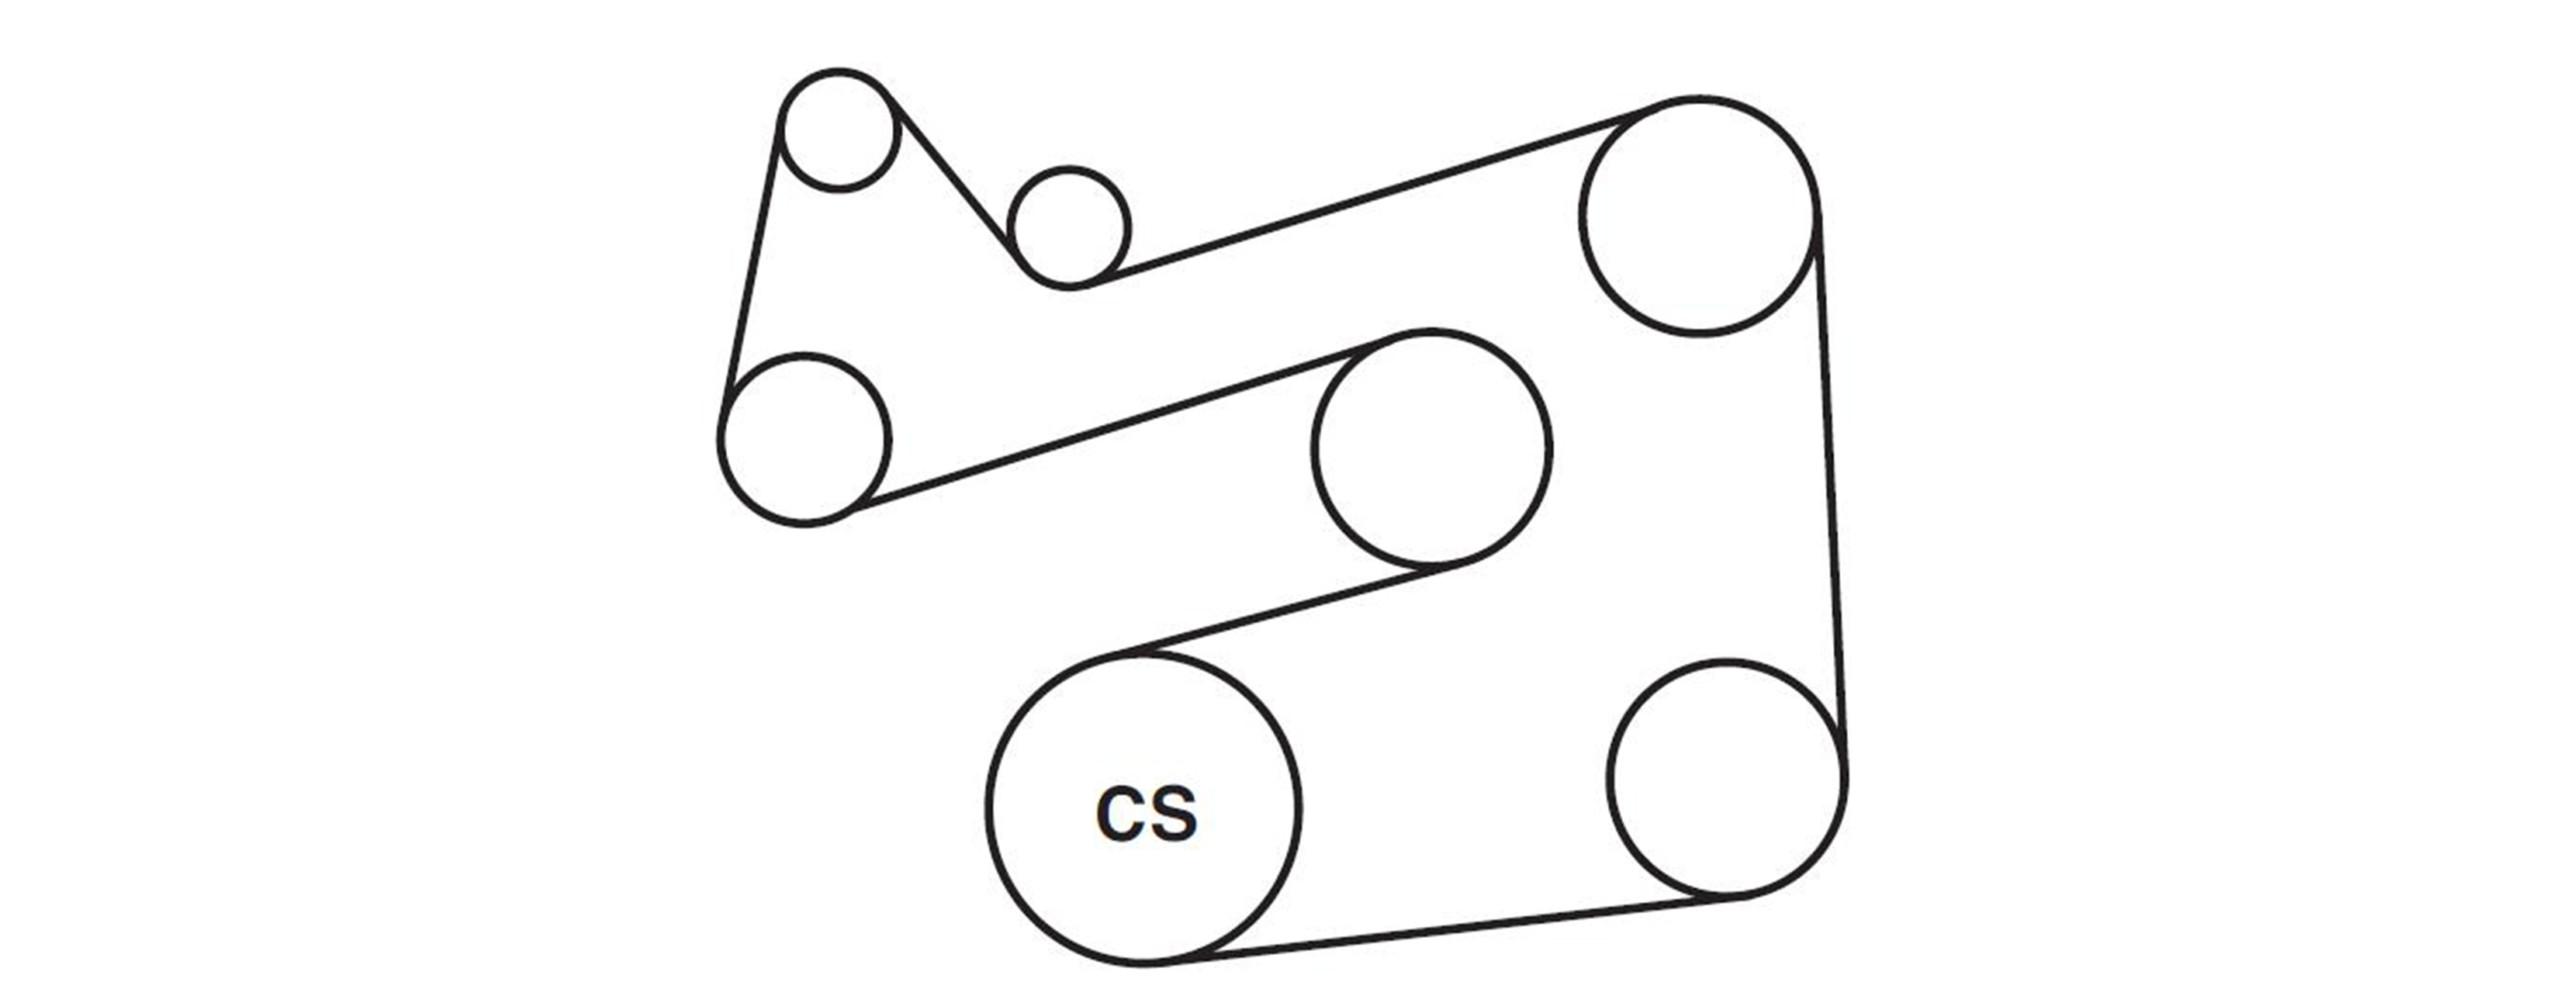 Ford Escape 3 0 Firing Order Diagram